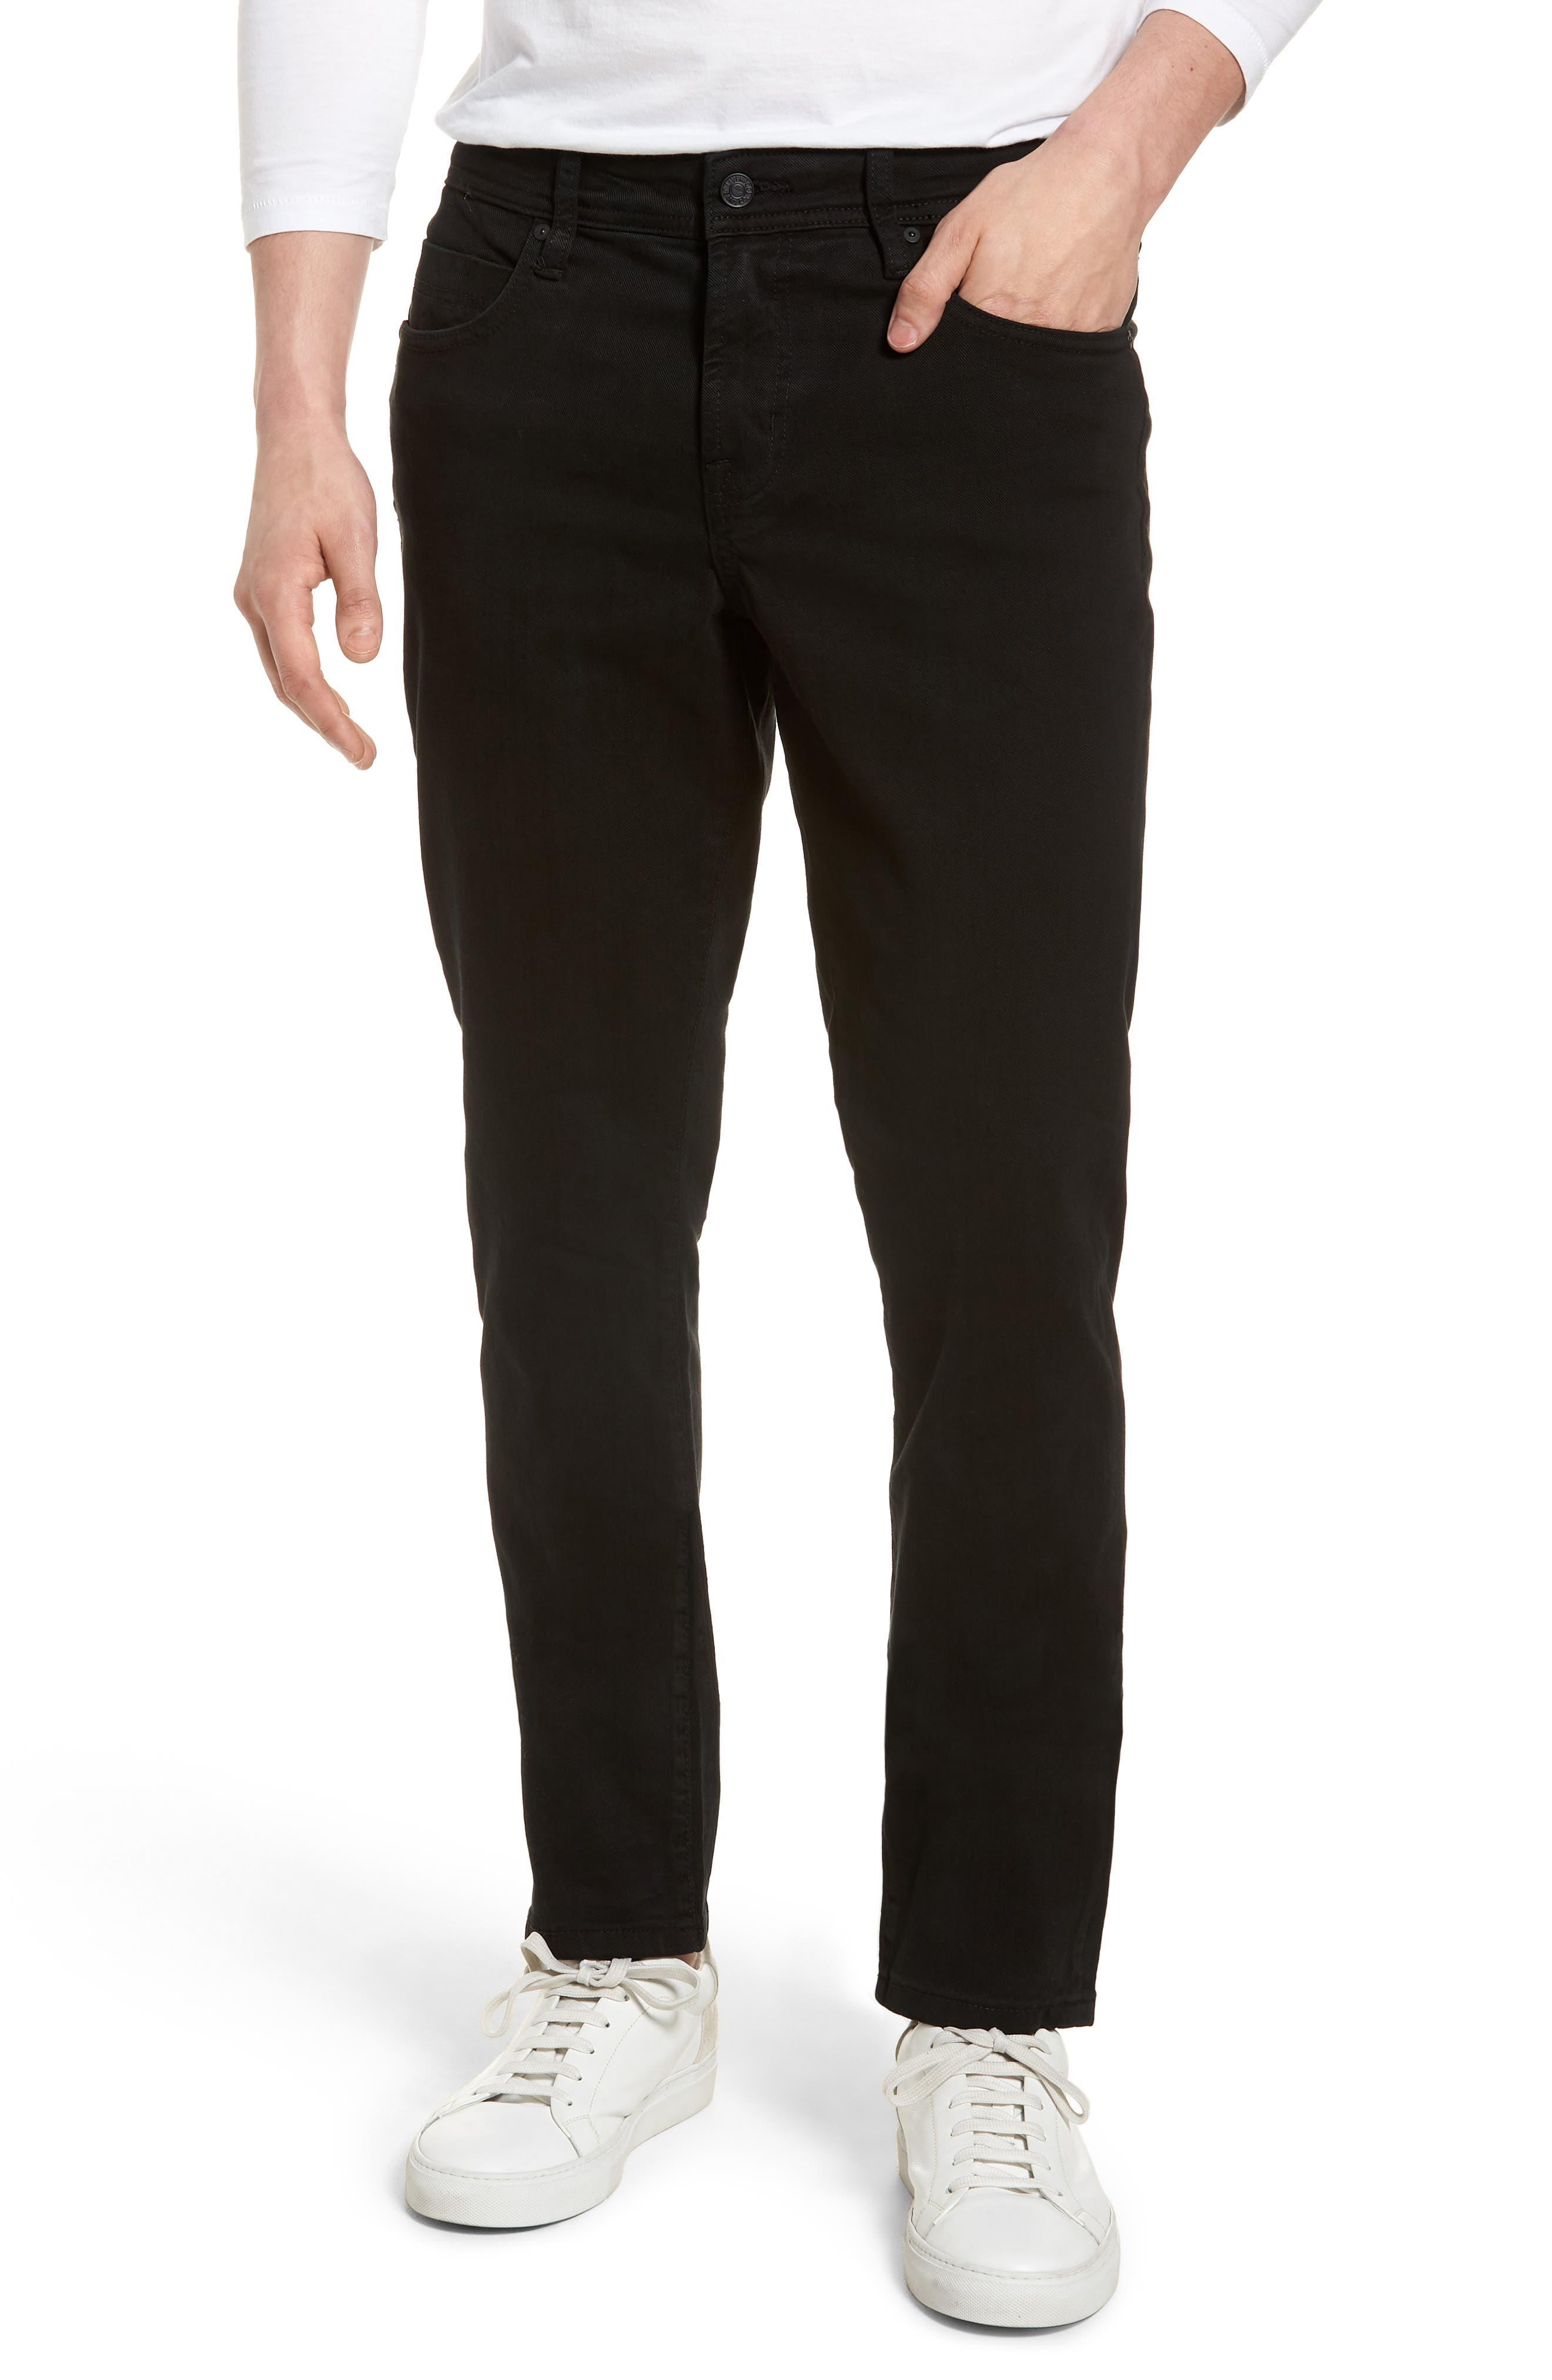 LIVERPOOL Kingston Modern Straight Leg Jeans, Main, color, 001